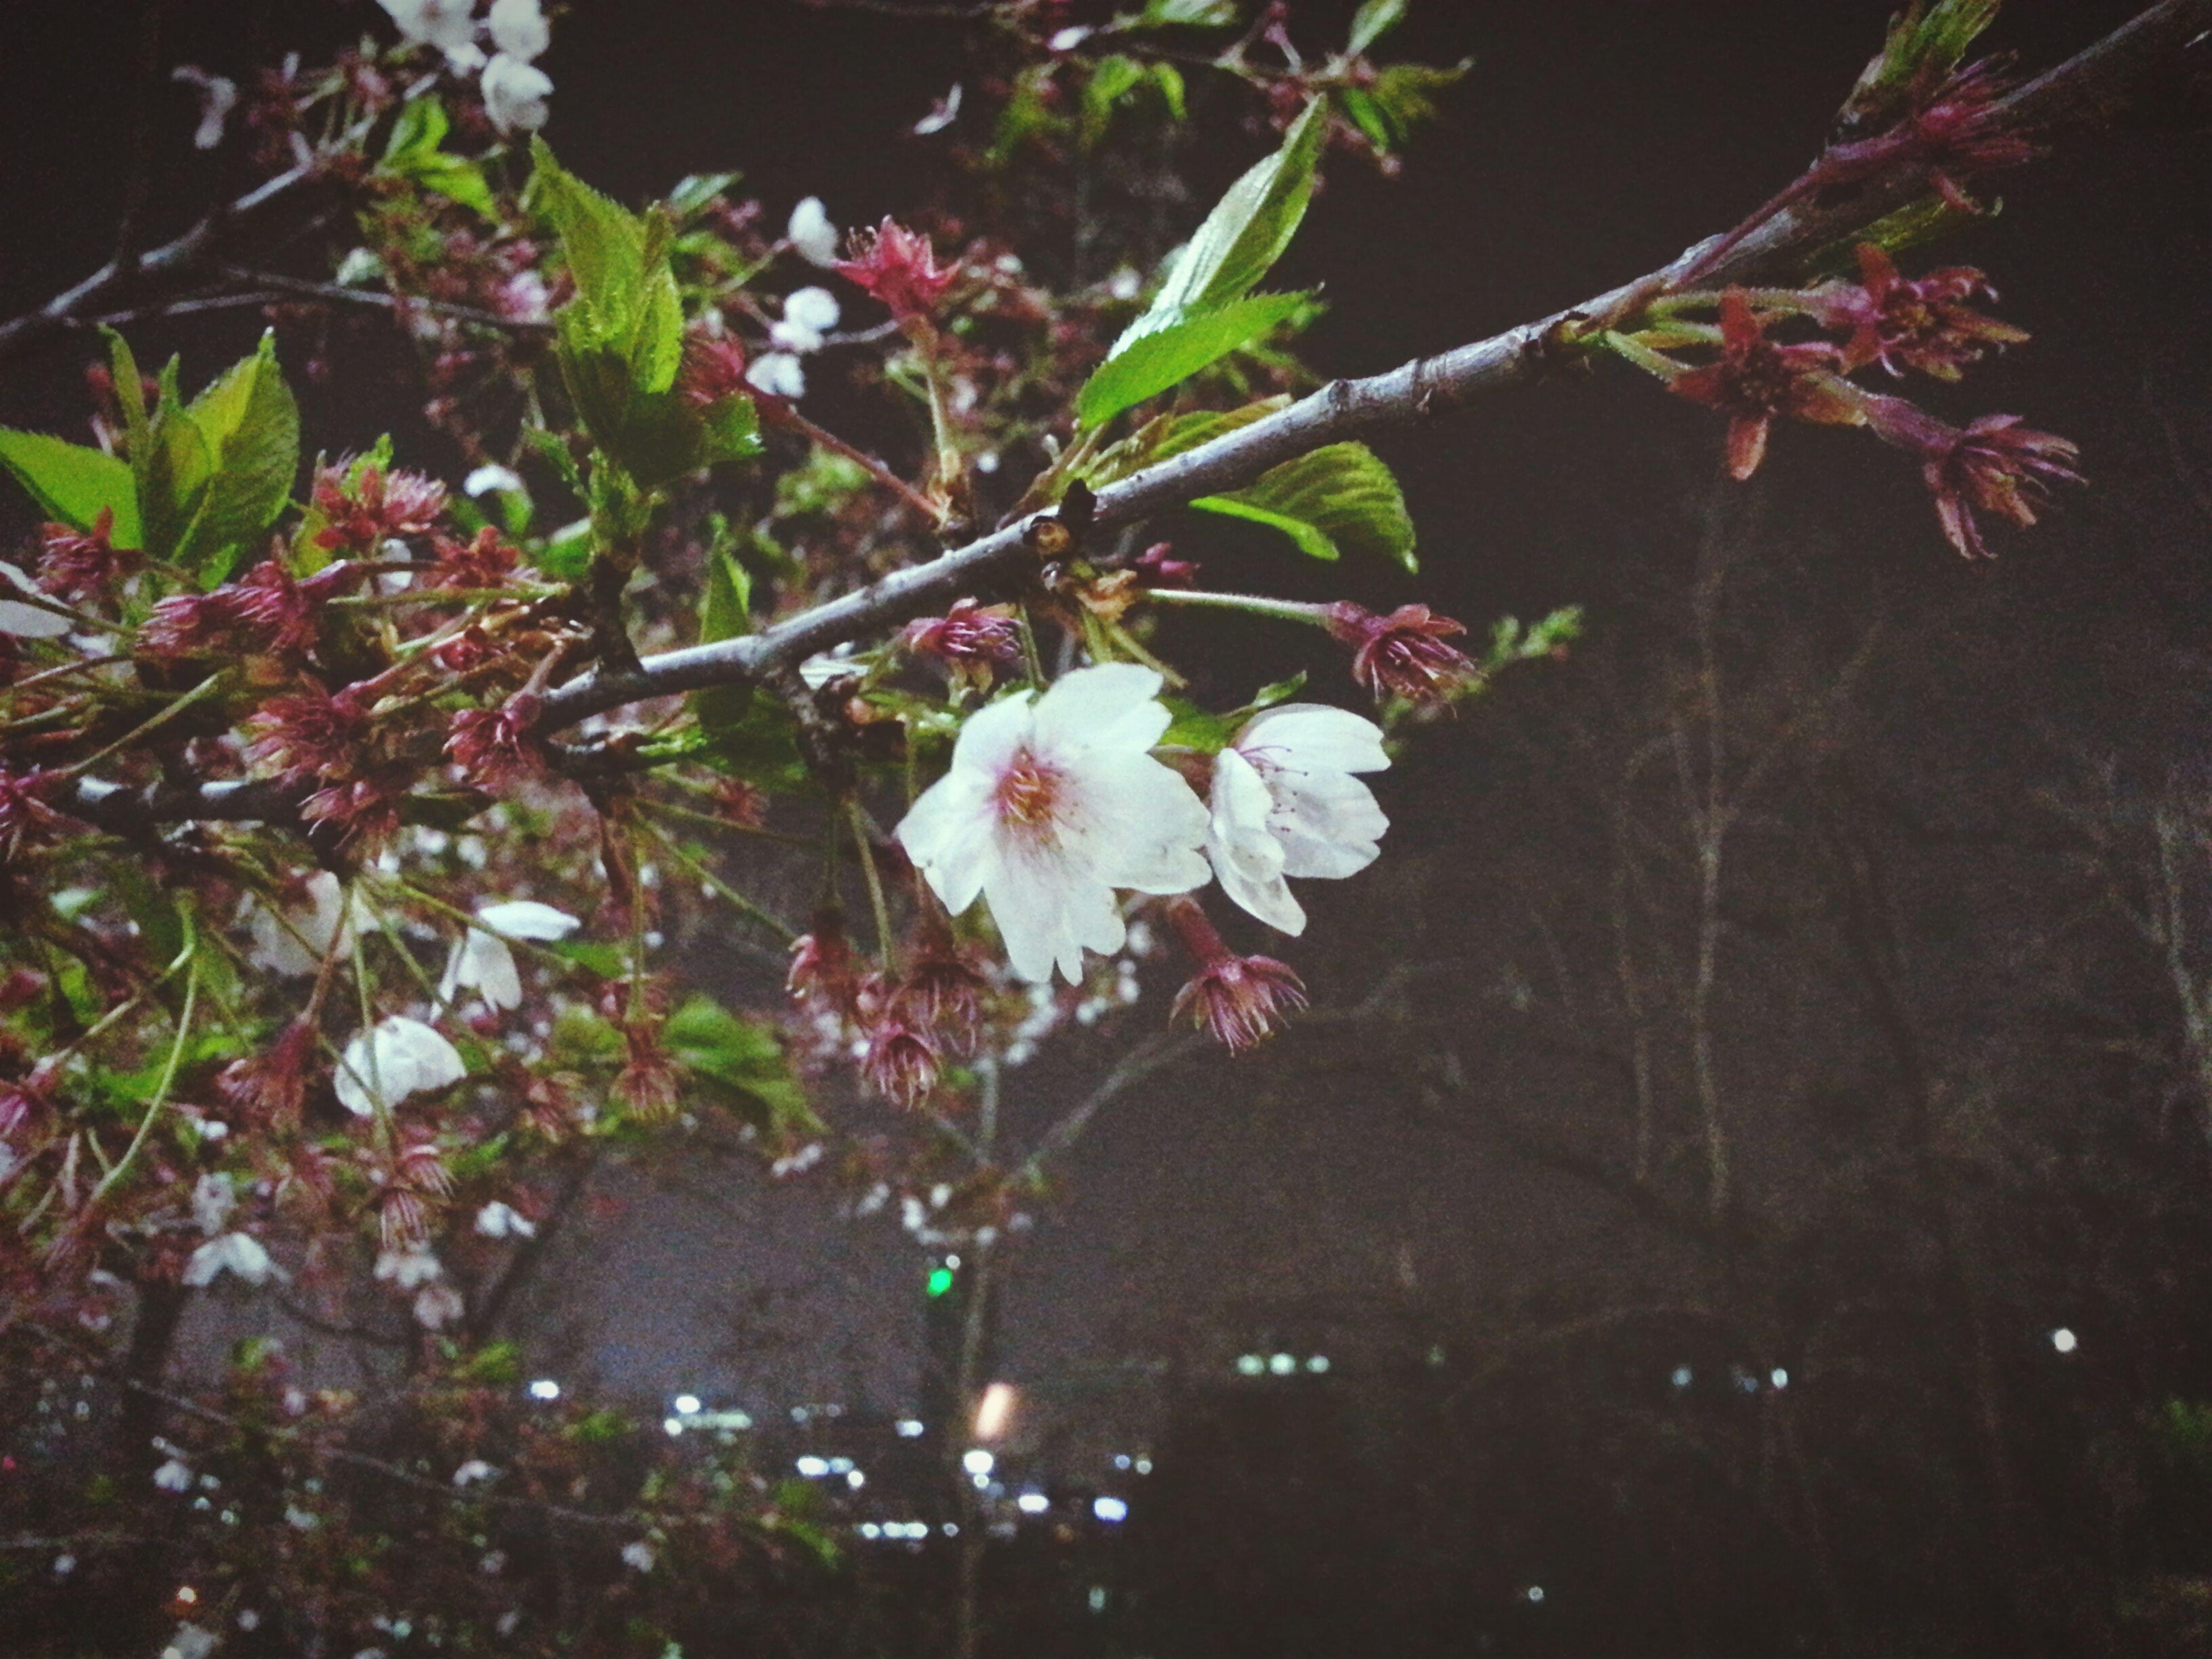 Last Cherry Blossom. Byespring.